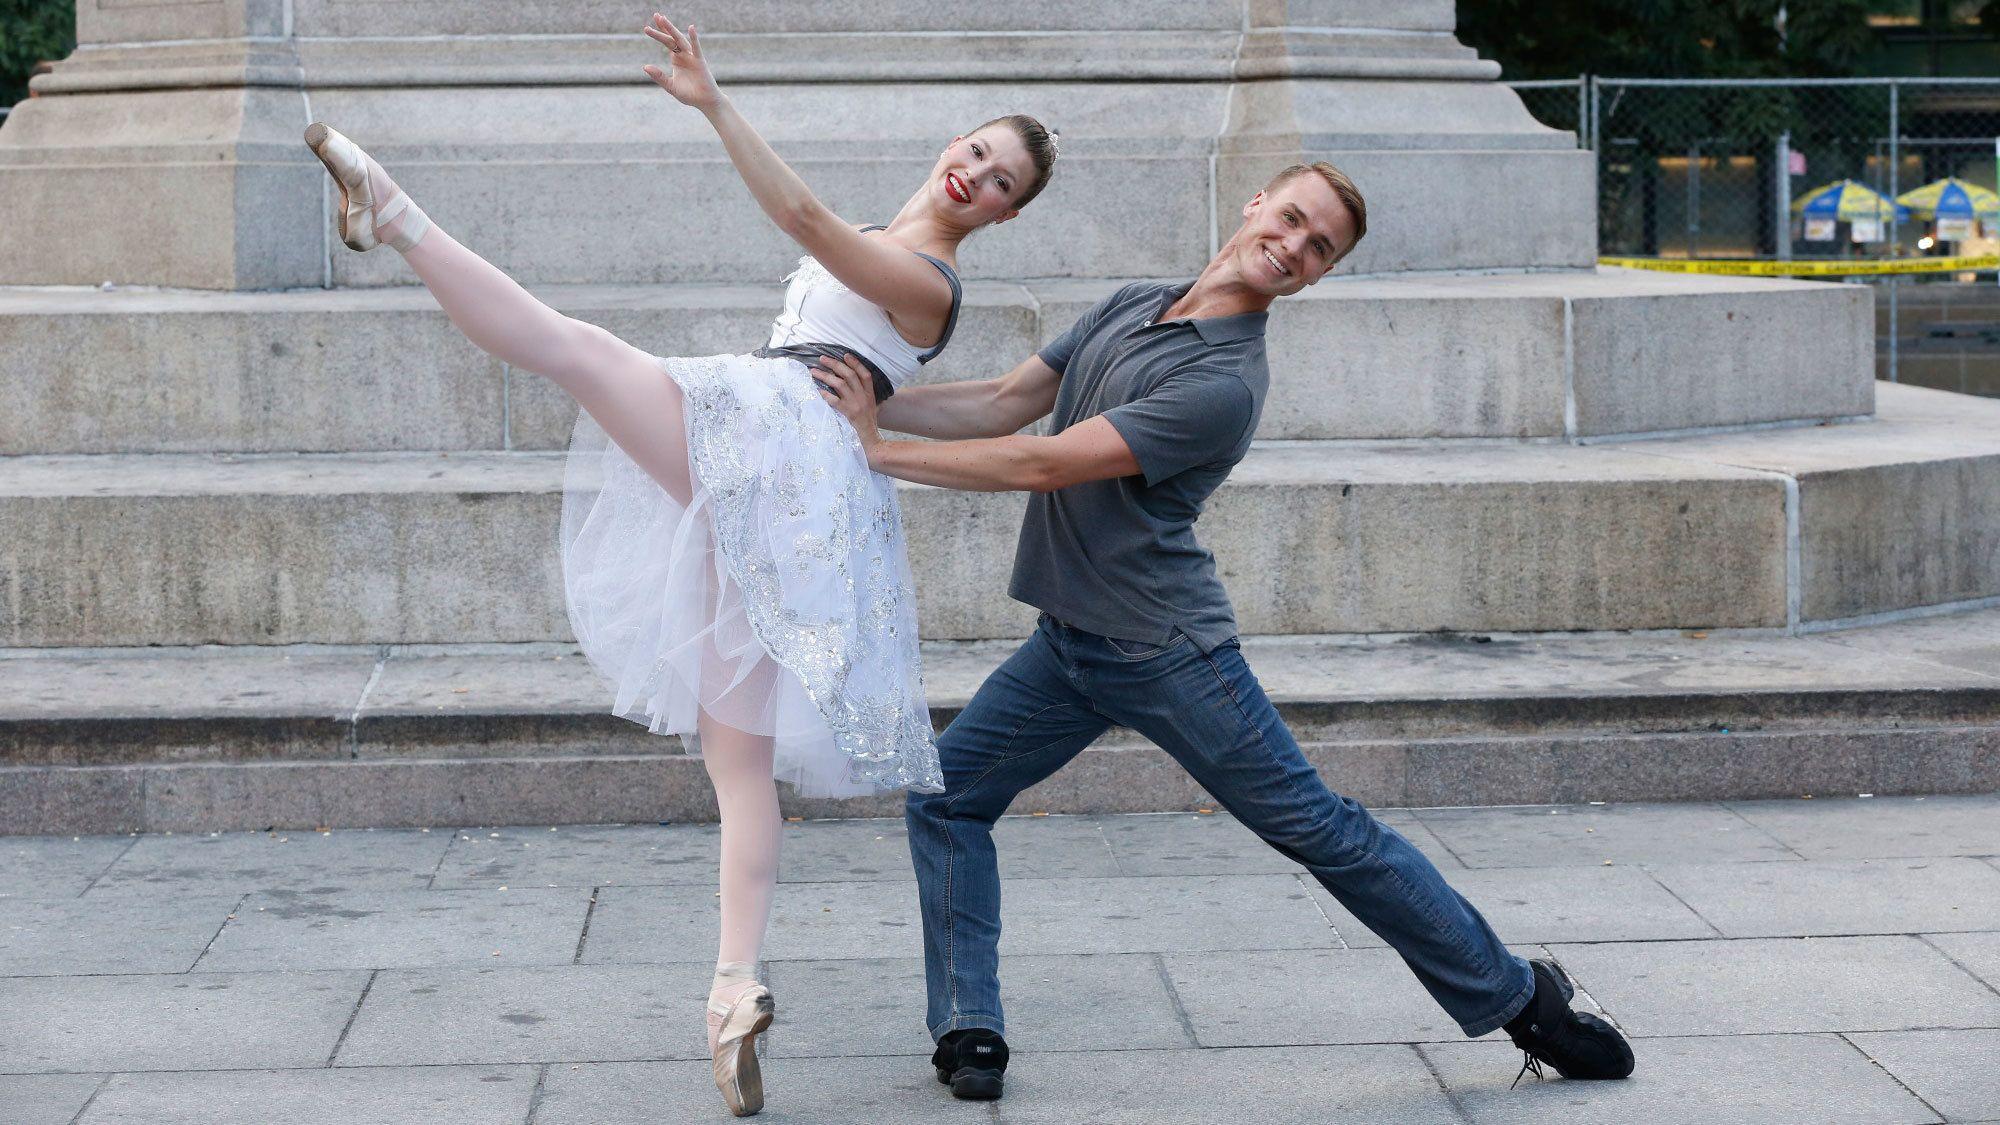 Ballet dancing couple on the sidewalk in New York